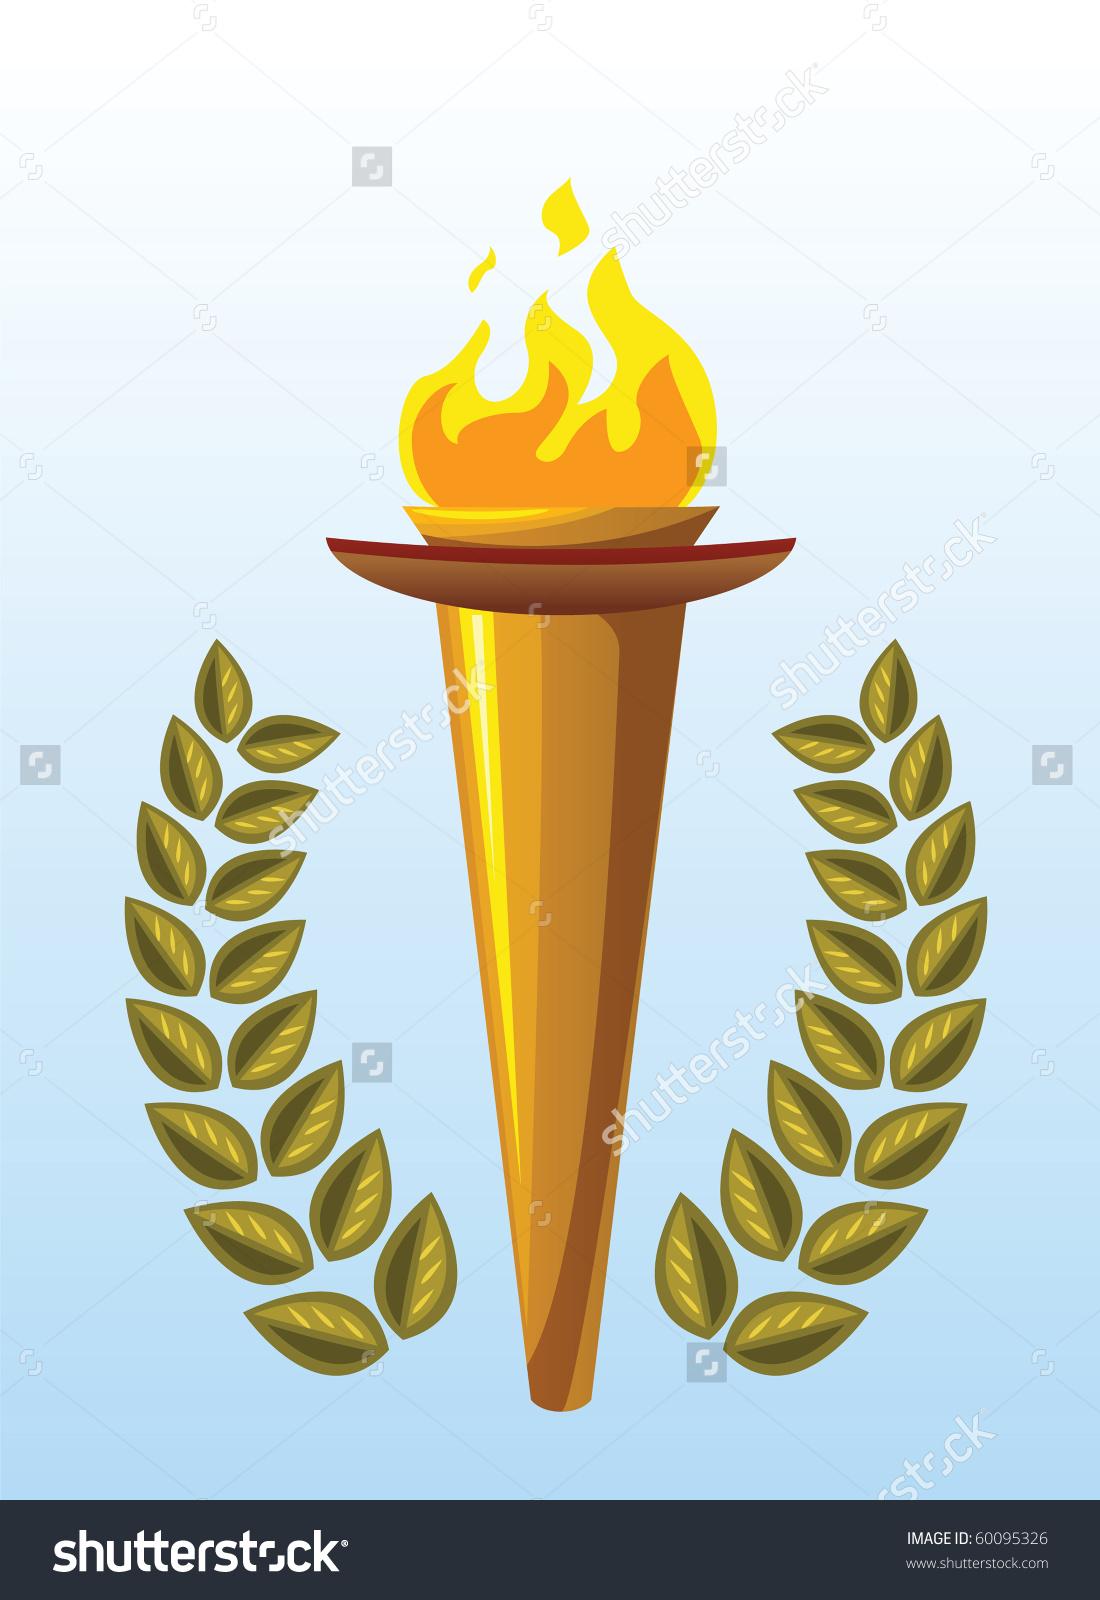 Olive Wreath Olympics Clipart.